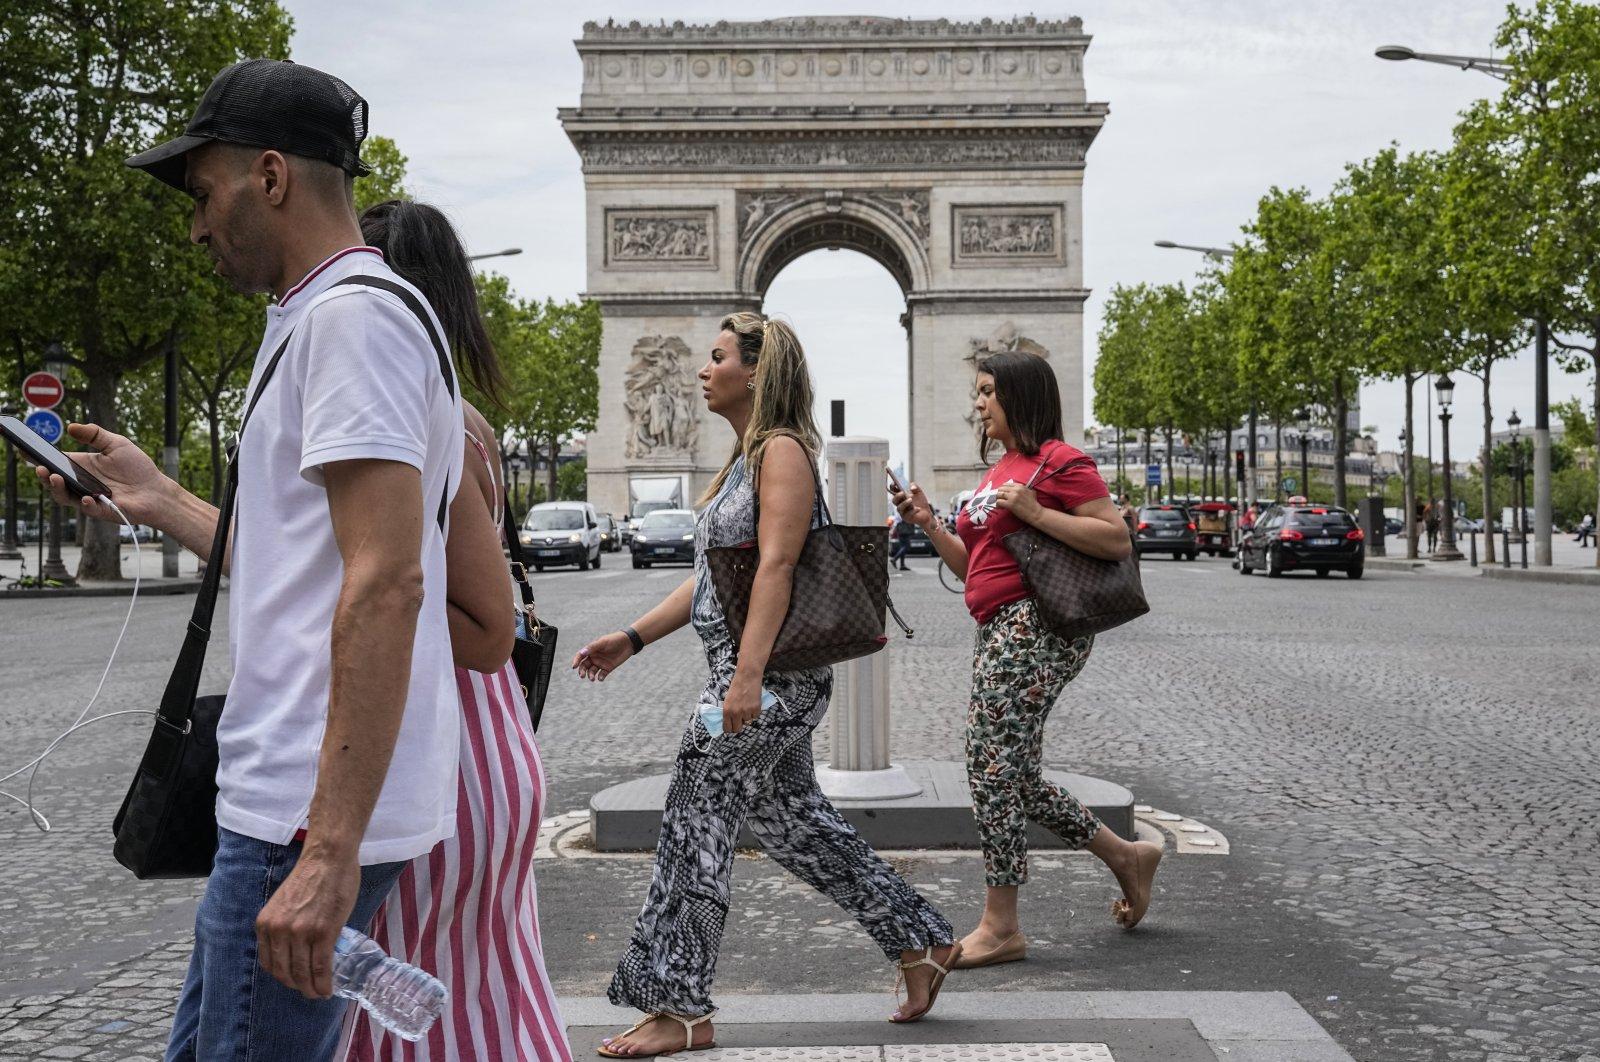 People cross Champs Elysees avenue in Paris, France, June 17, 2021. (AP Photo)